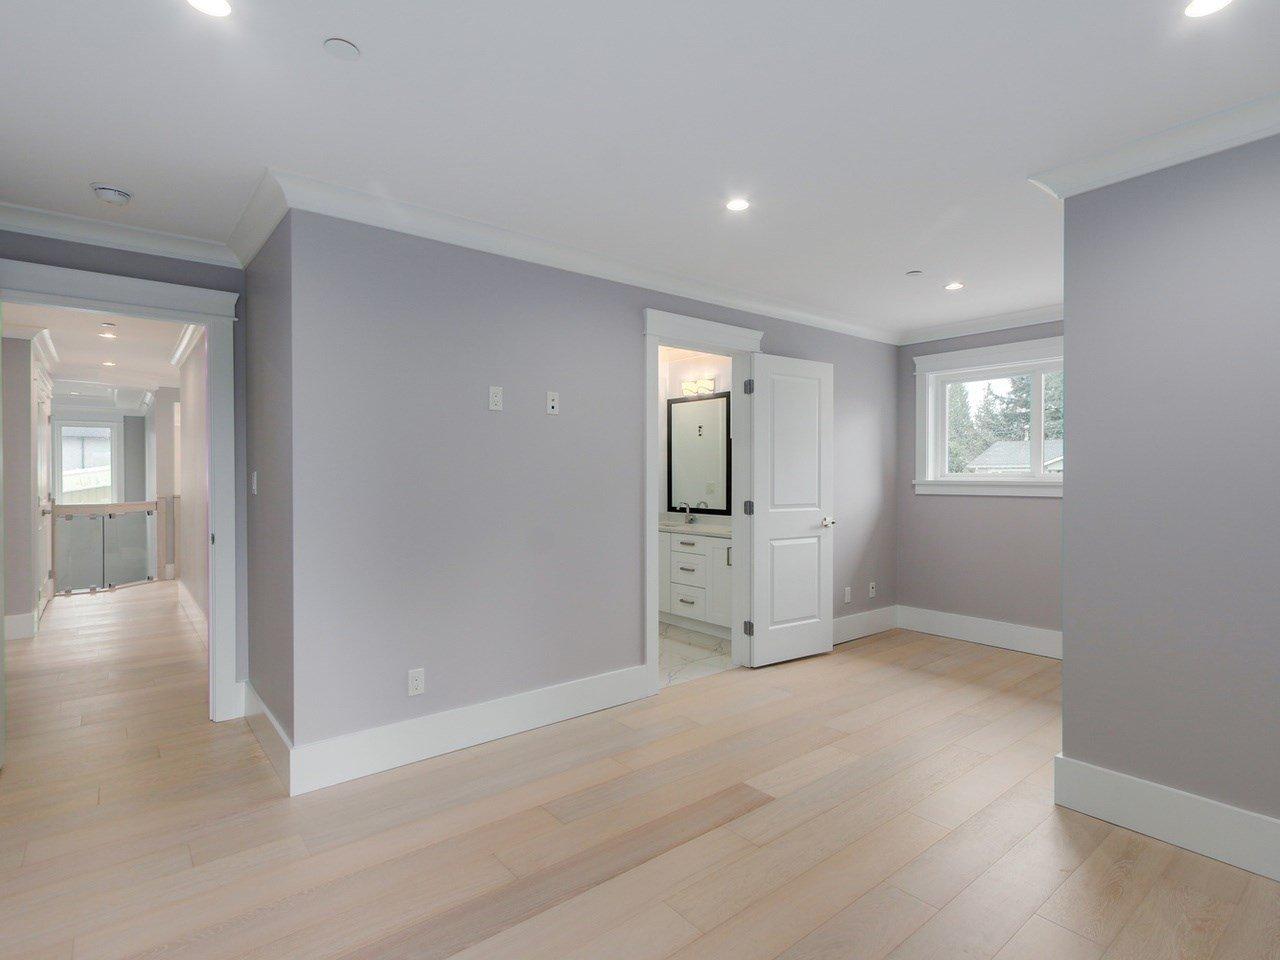 Photo 15: Photos: 1560 MAPLE Street: White Rock House for sale (South Surrey White Rock)  : MLS®# R2138926